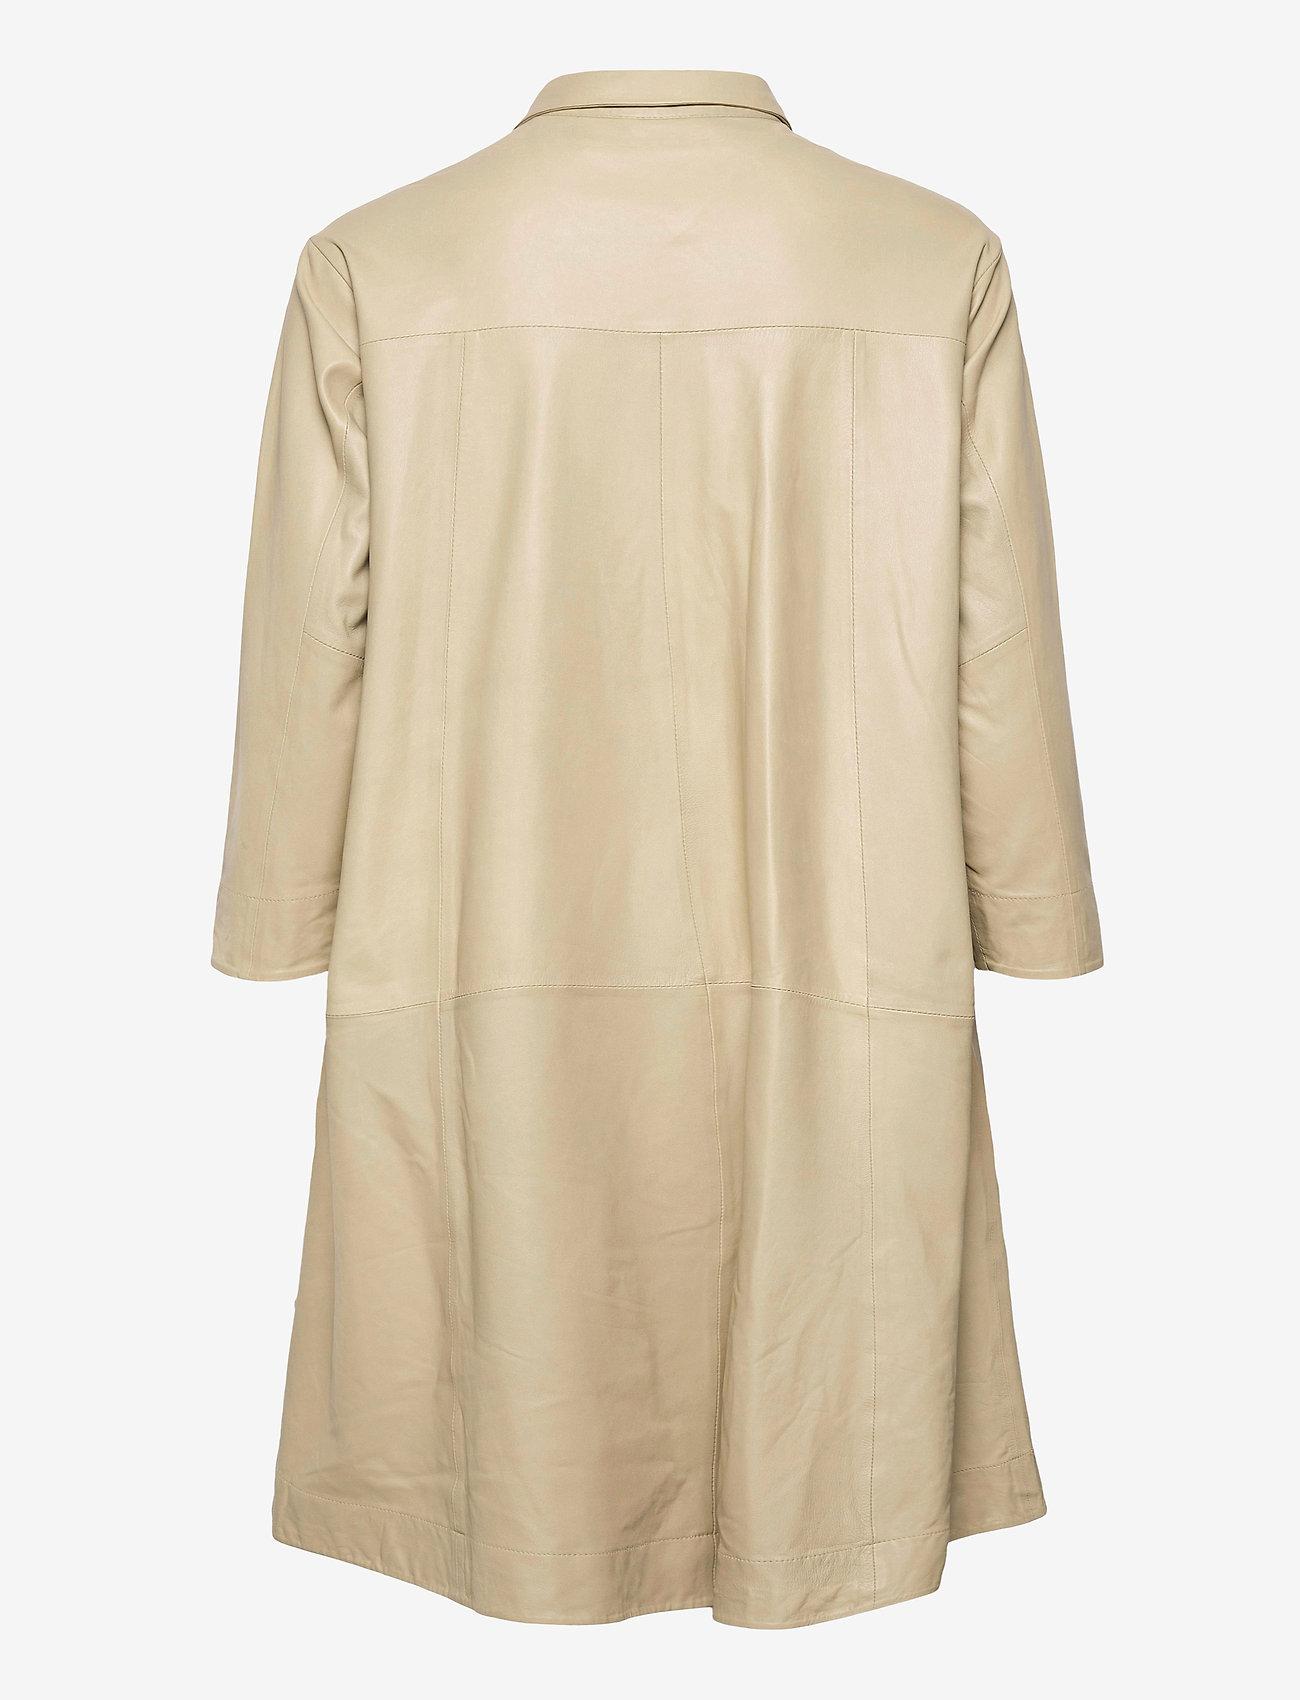 MDK / Munderingskompagniet - Chili thin leather dress - korta klänningar - pale khaki - 1